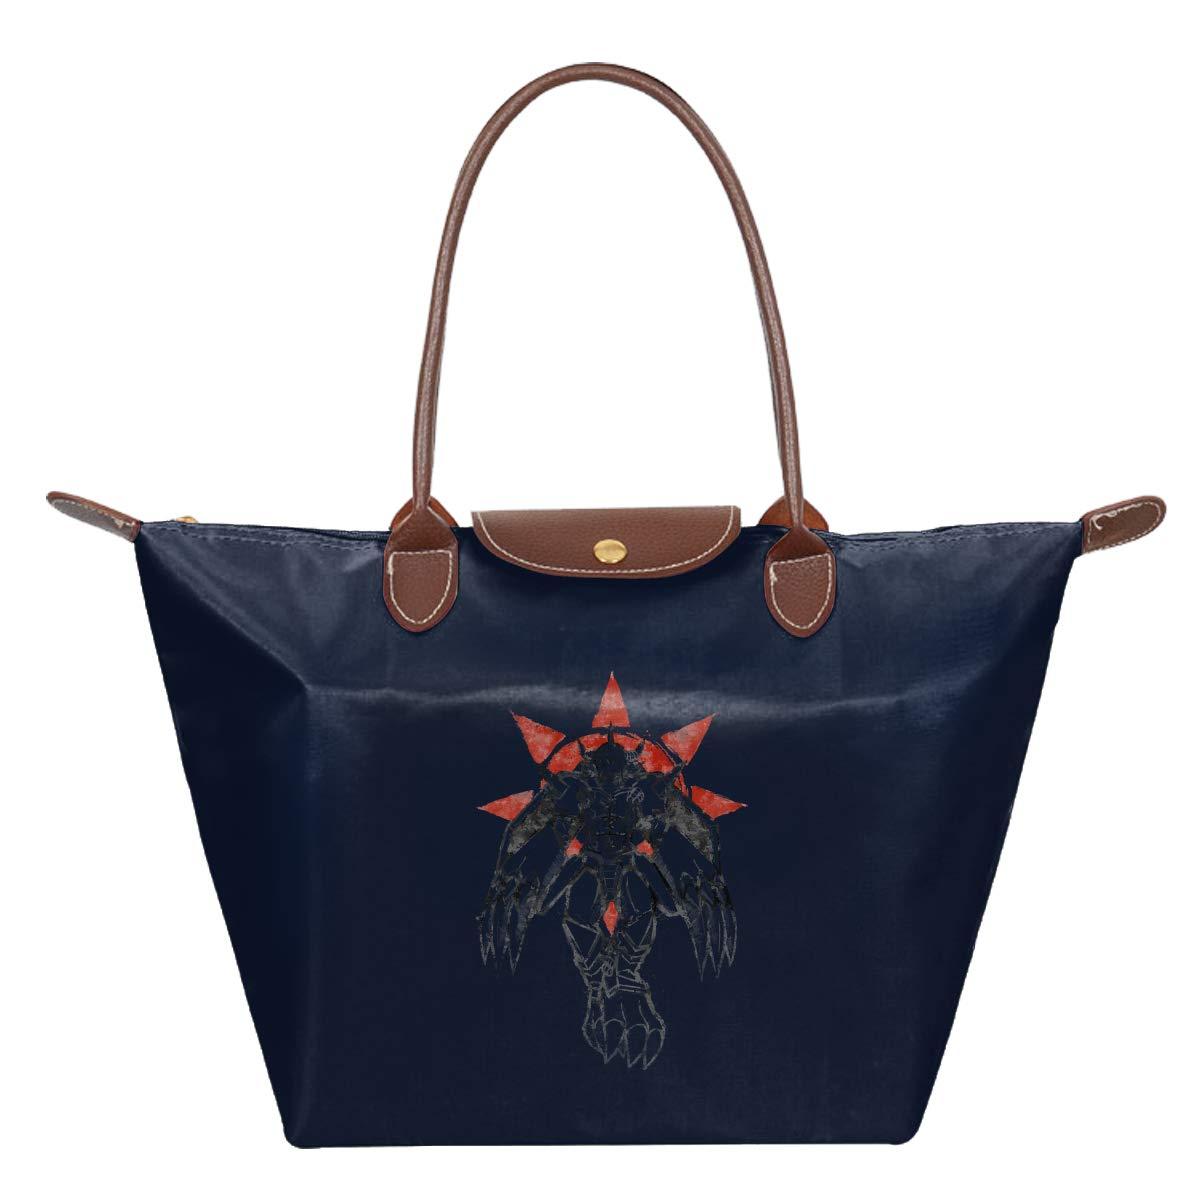 Di-gimon Wargreymon Grafitti Crest Of Courage Waterproof Leather Folded Messenger Nylon Bag Travel Tote Hopping Folding School Handbags